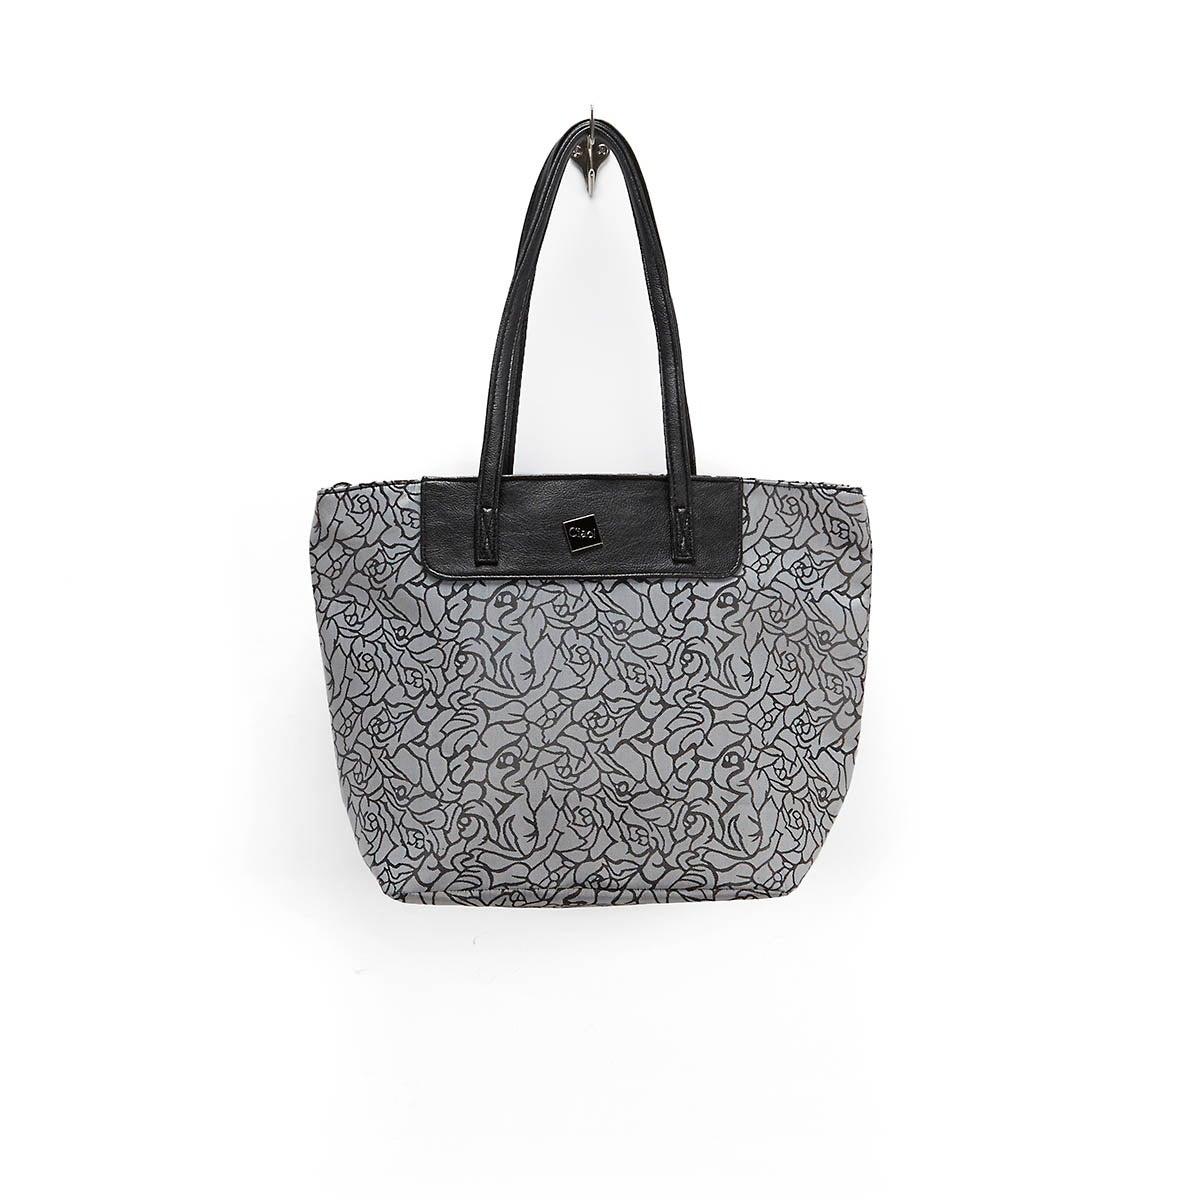 Lds Edith grey printed cooler bag